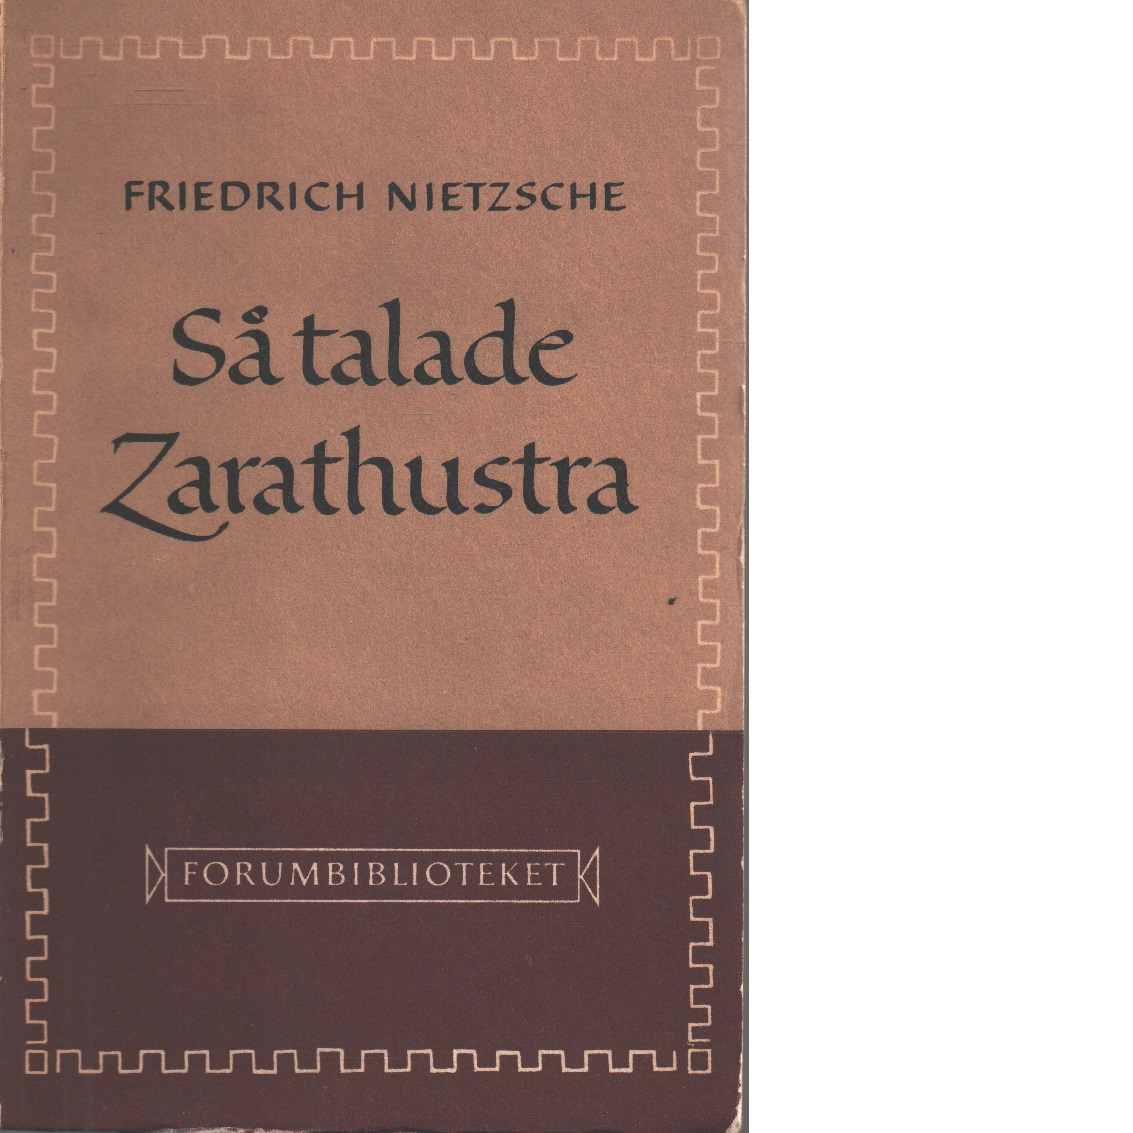 Så talade Zarathustra - Nietzsche, Friedrich